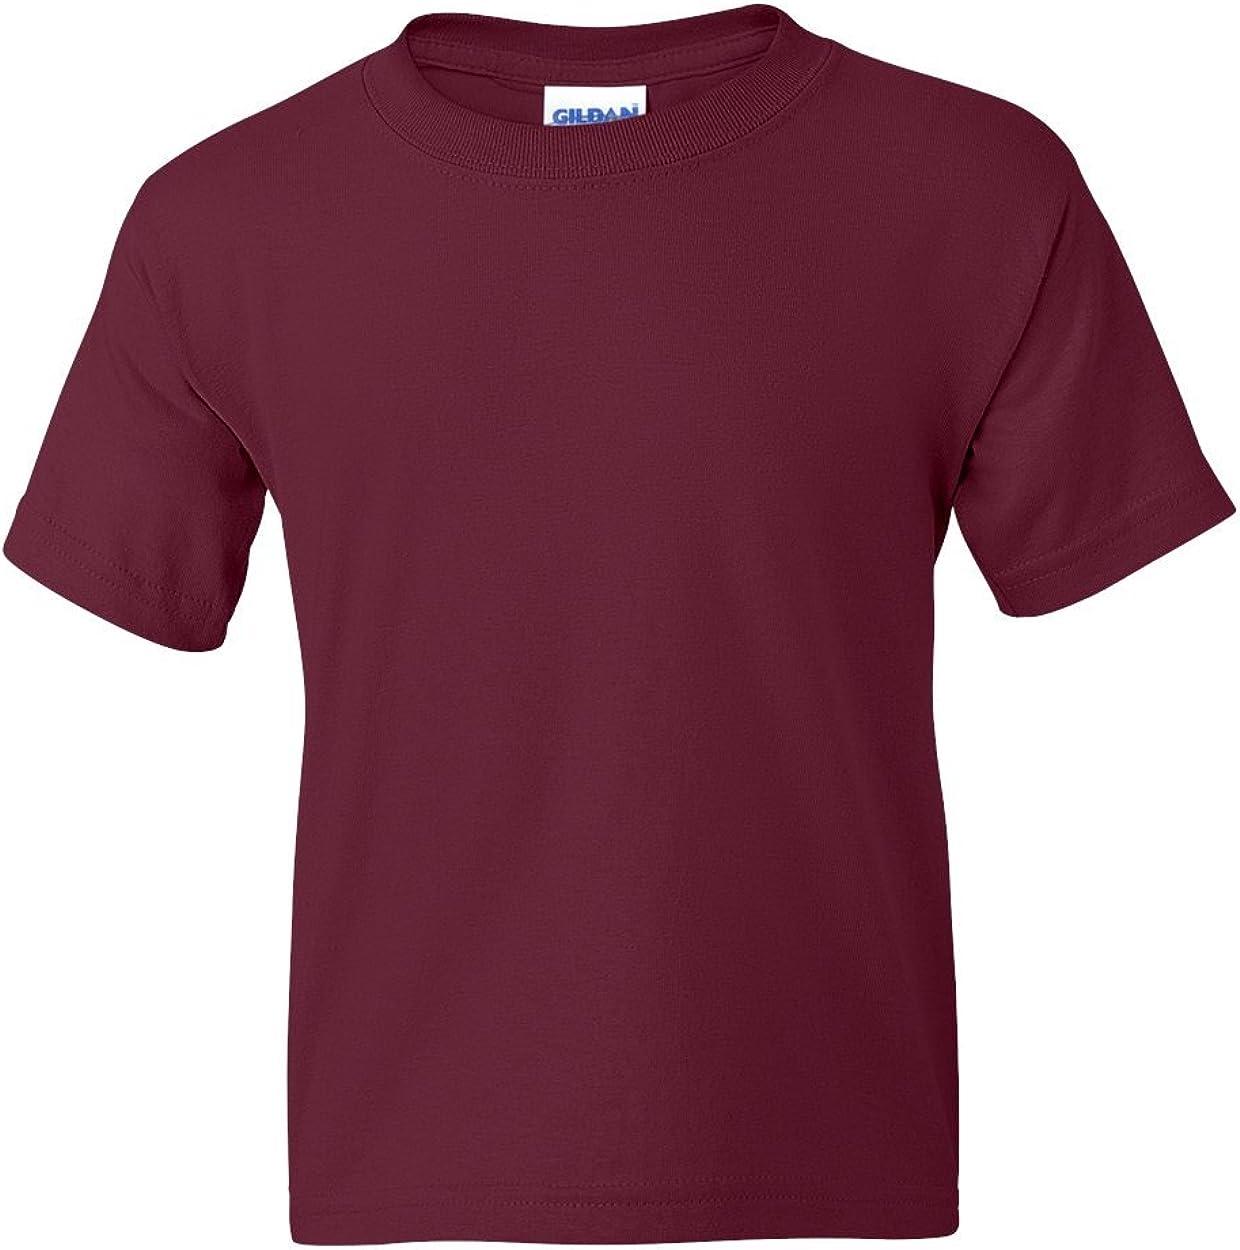 5.5 oz, 50/50 T-Shirt (G800B) Maroon, L (Pack of 12)